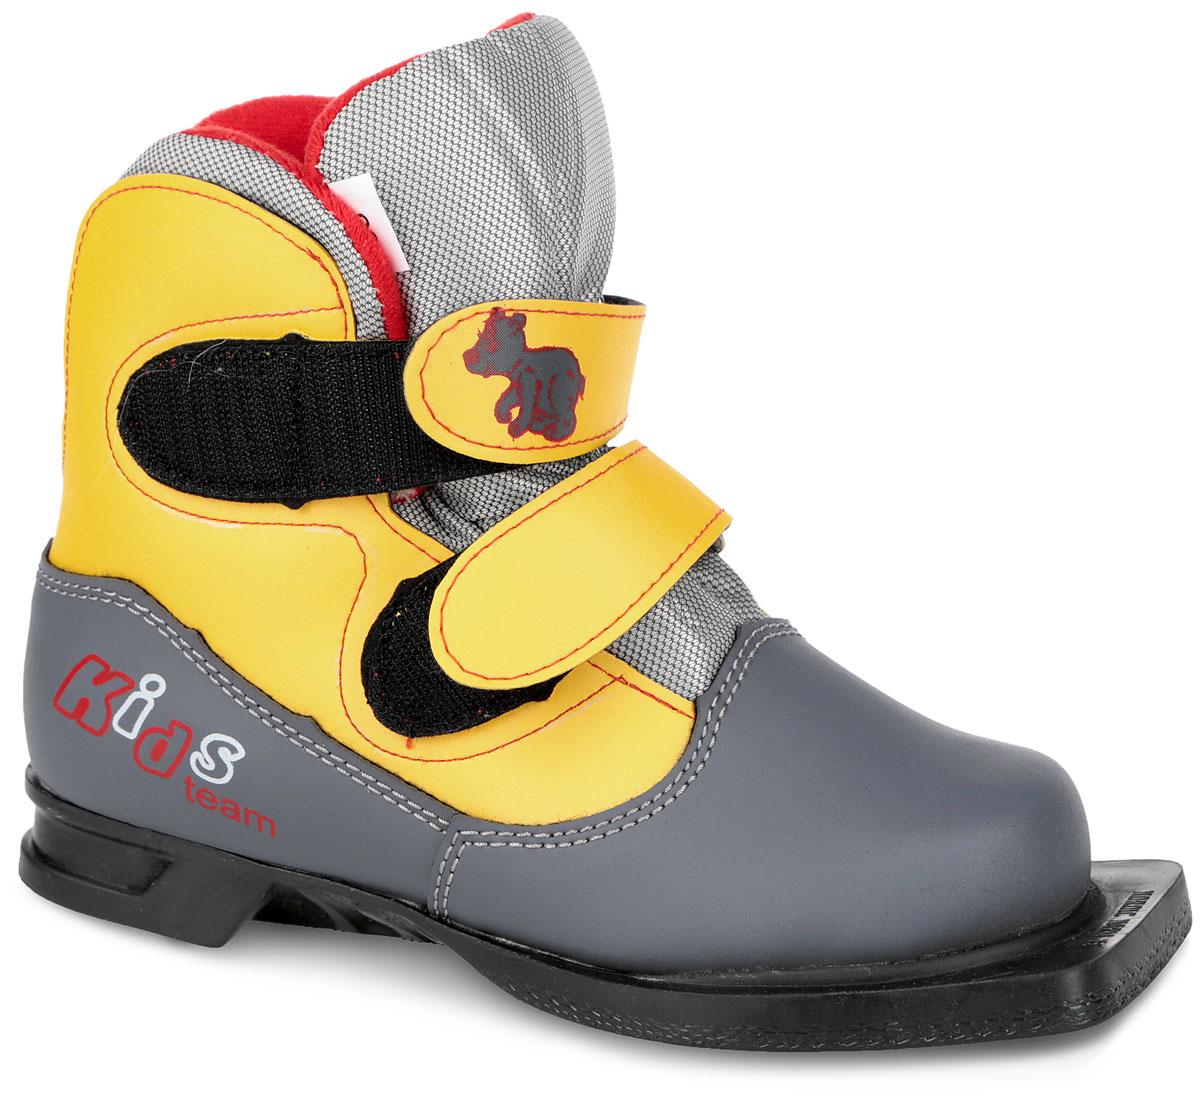 Ботинки лыжные детские Marax, цвет: серый, желтый. NN75. Размер 35